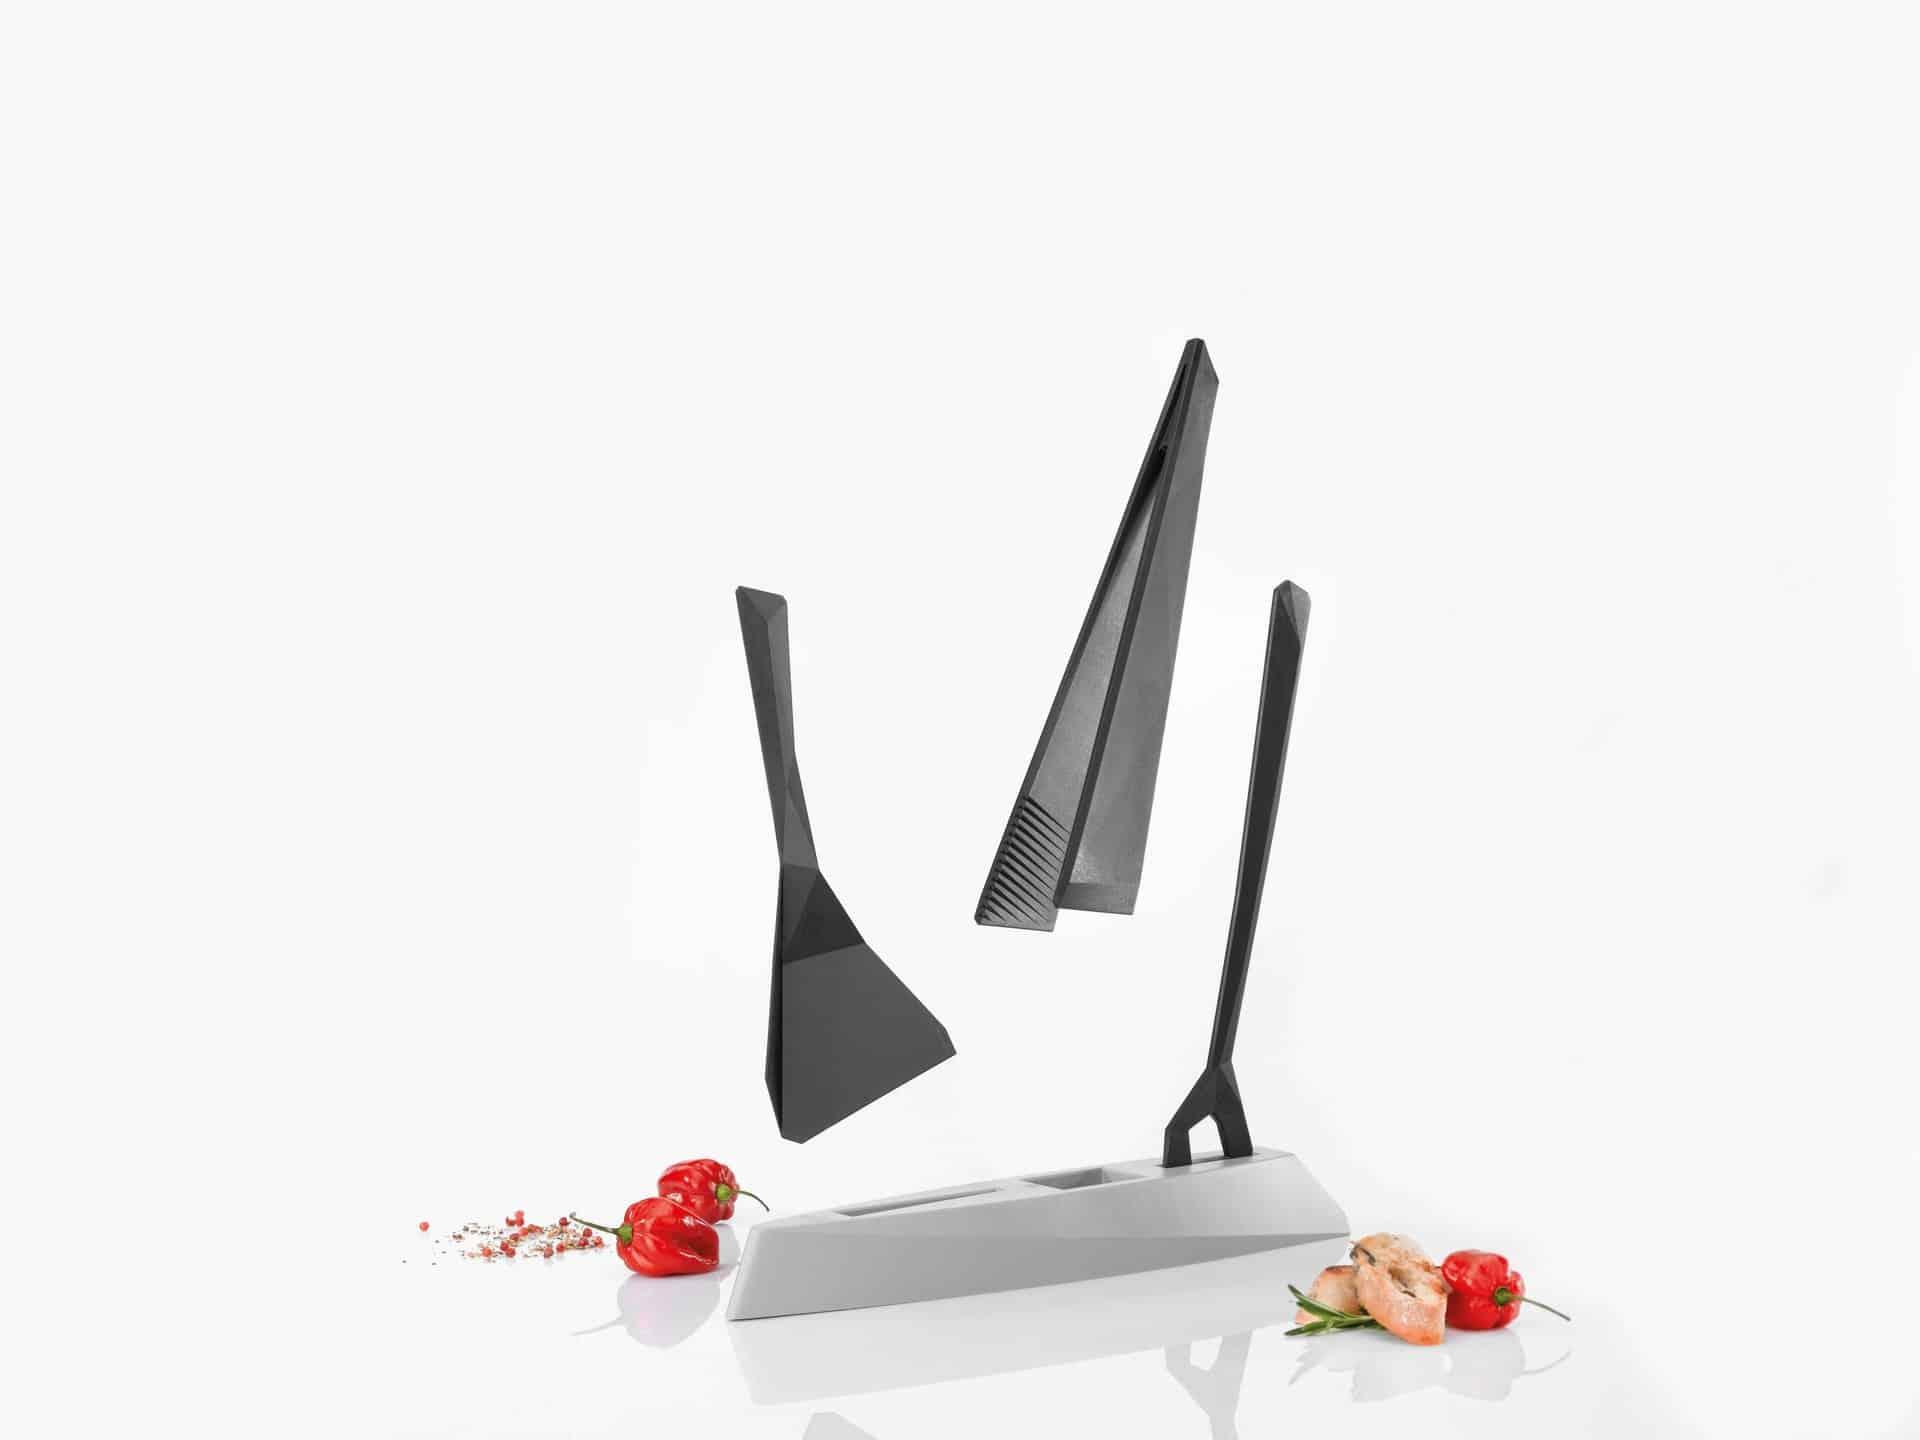 Kitchen Koziol Design Utensils Stand